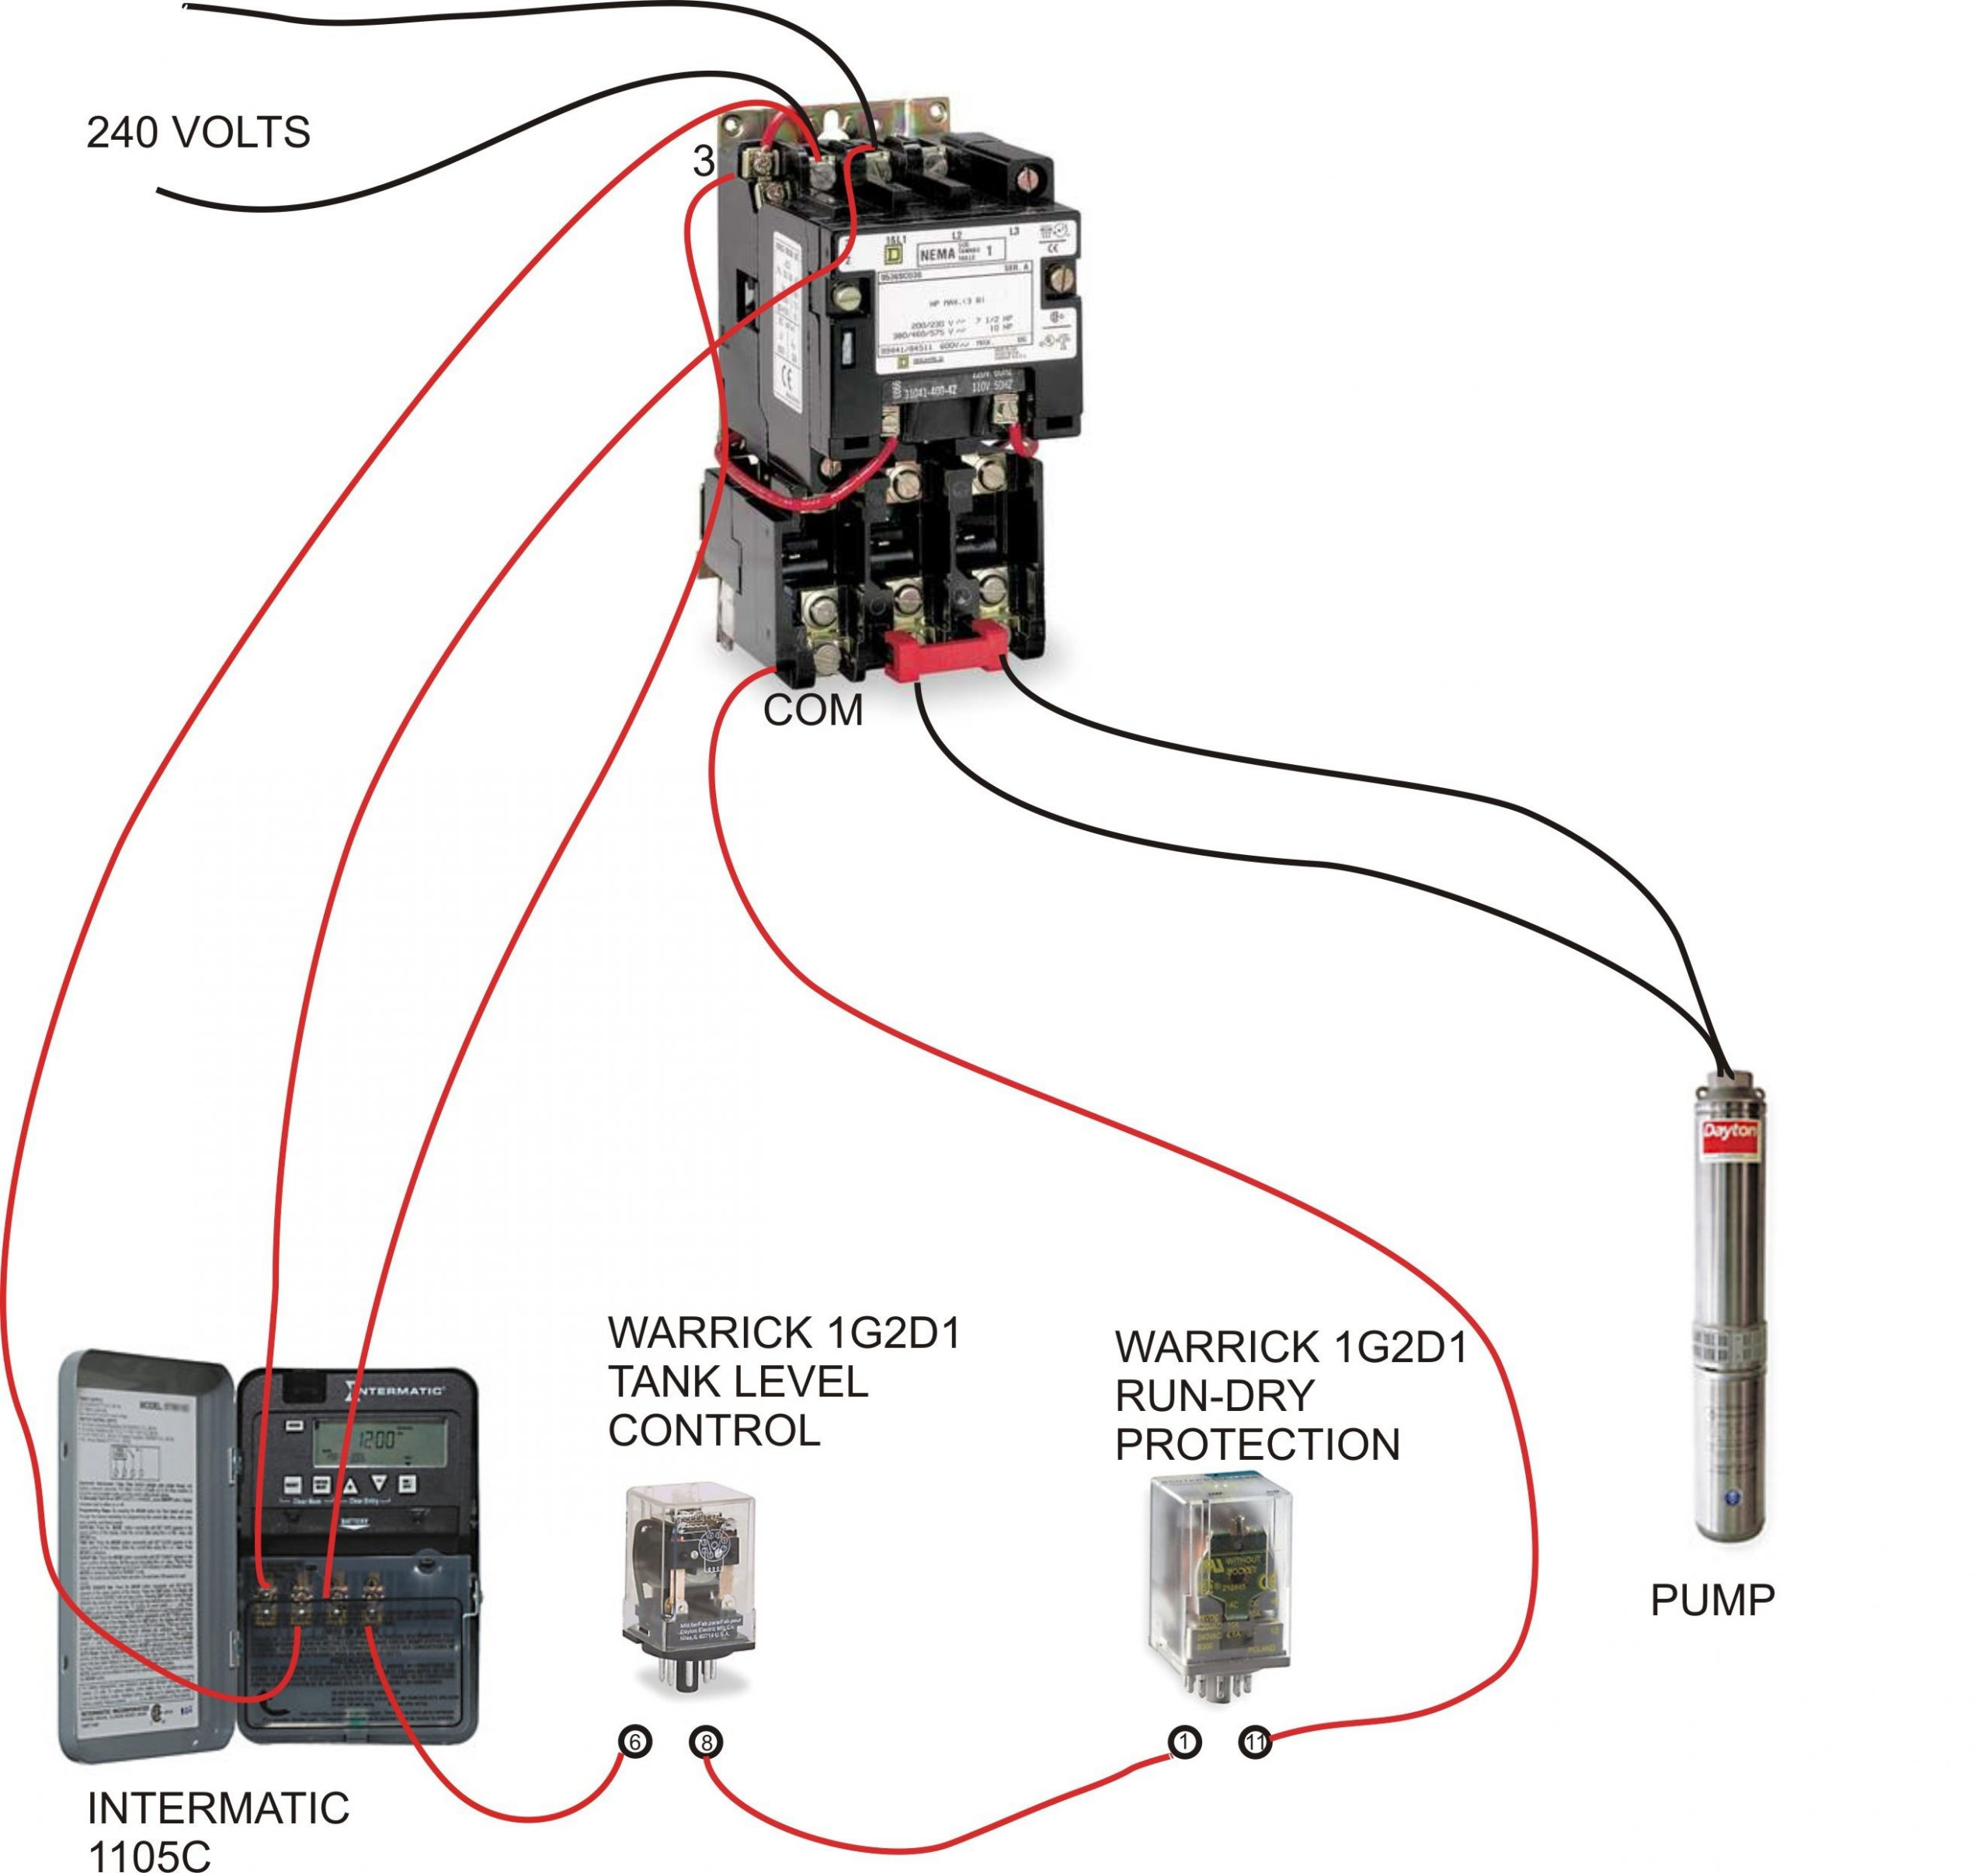 Pump Start Relay Wiring Diagram Irrigation Pump Start Relay Wiring Diagram Collection Of Pump Start Relay Wiring Diagram